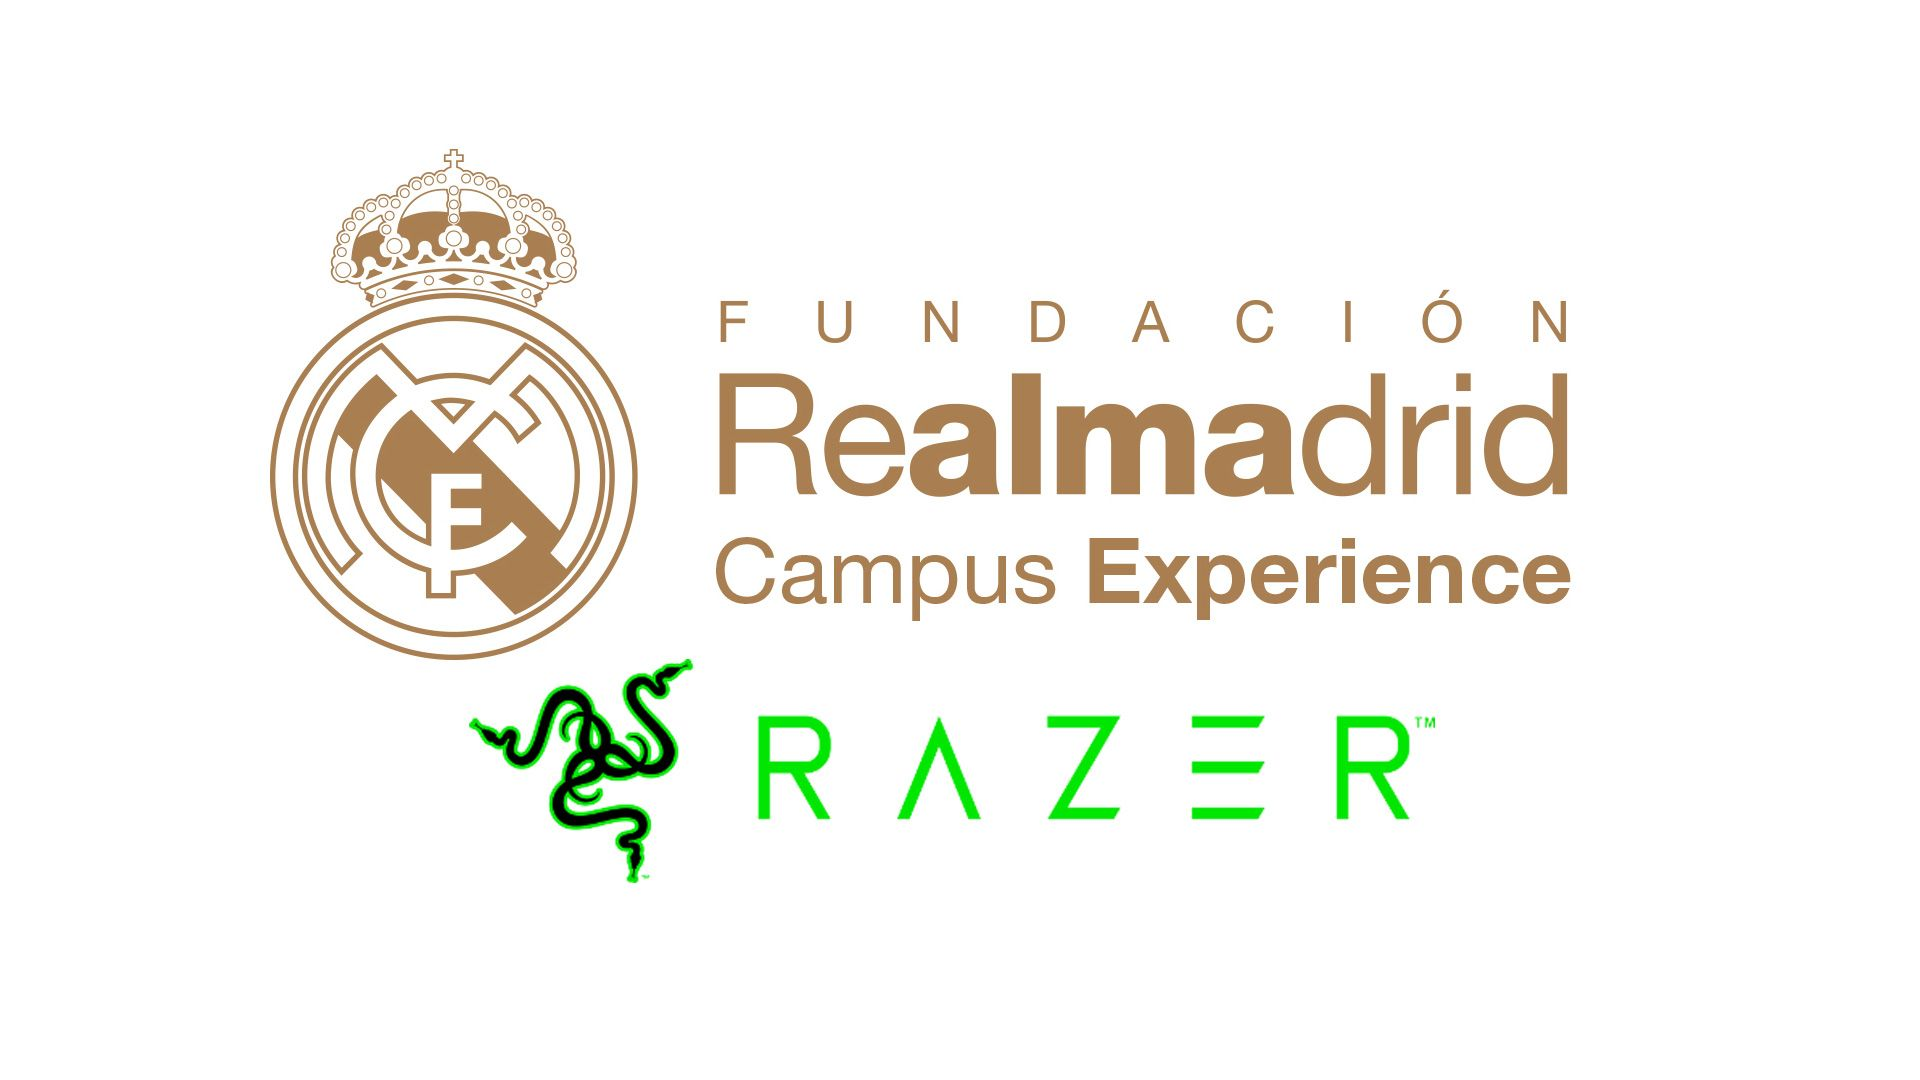 fundacion campus experience real madrid razer